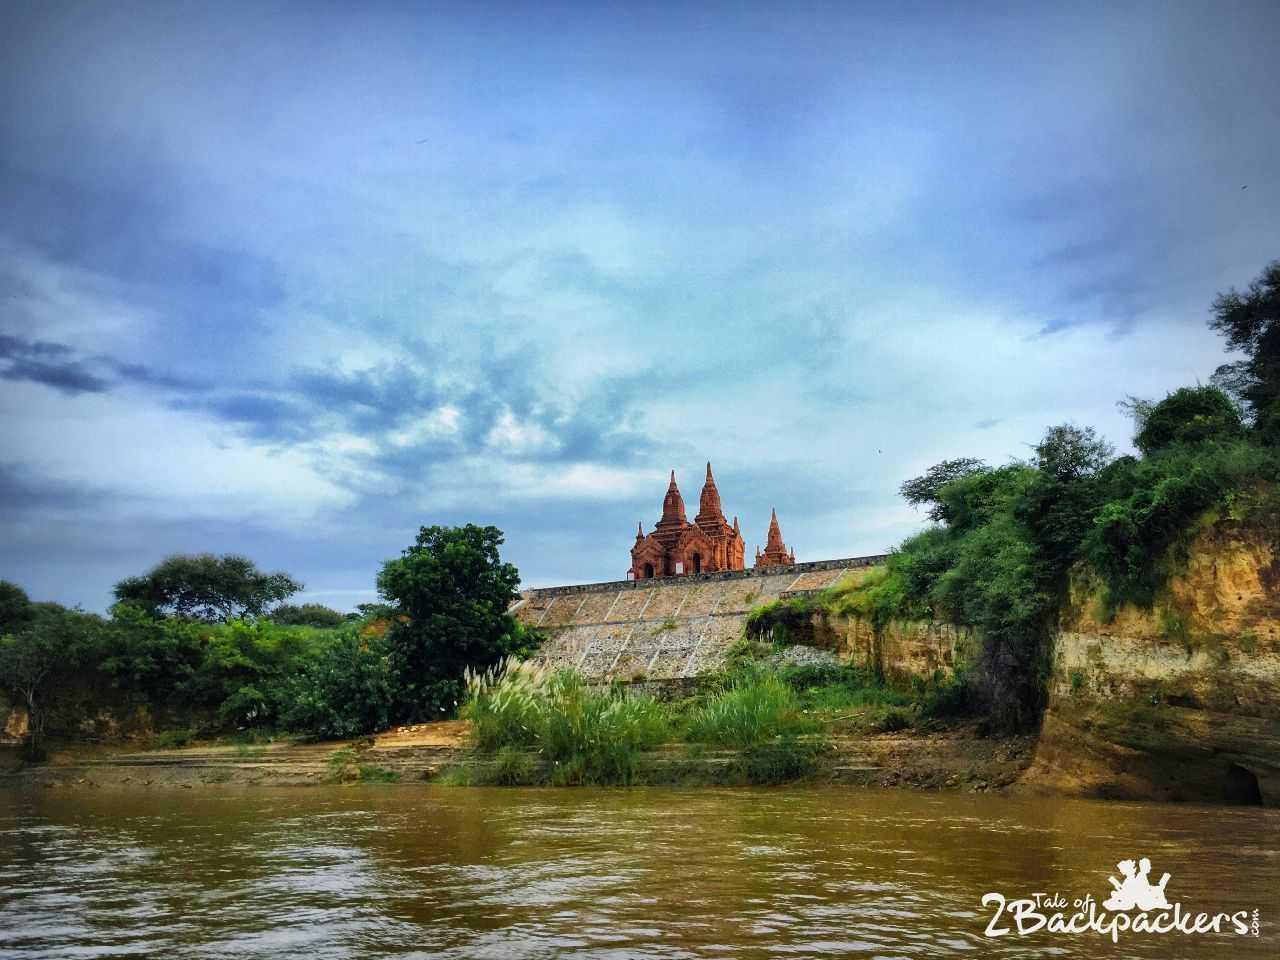 View from river cruise, Bagan, Myanmar